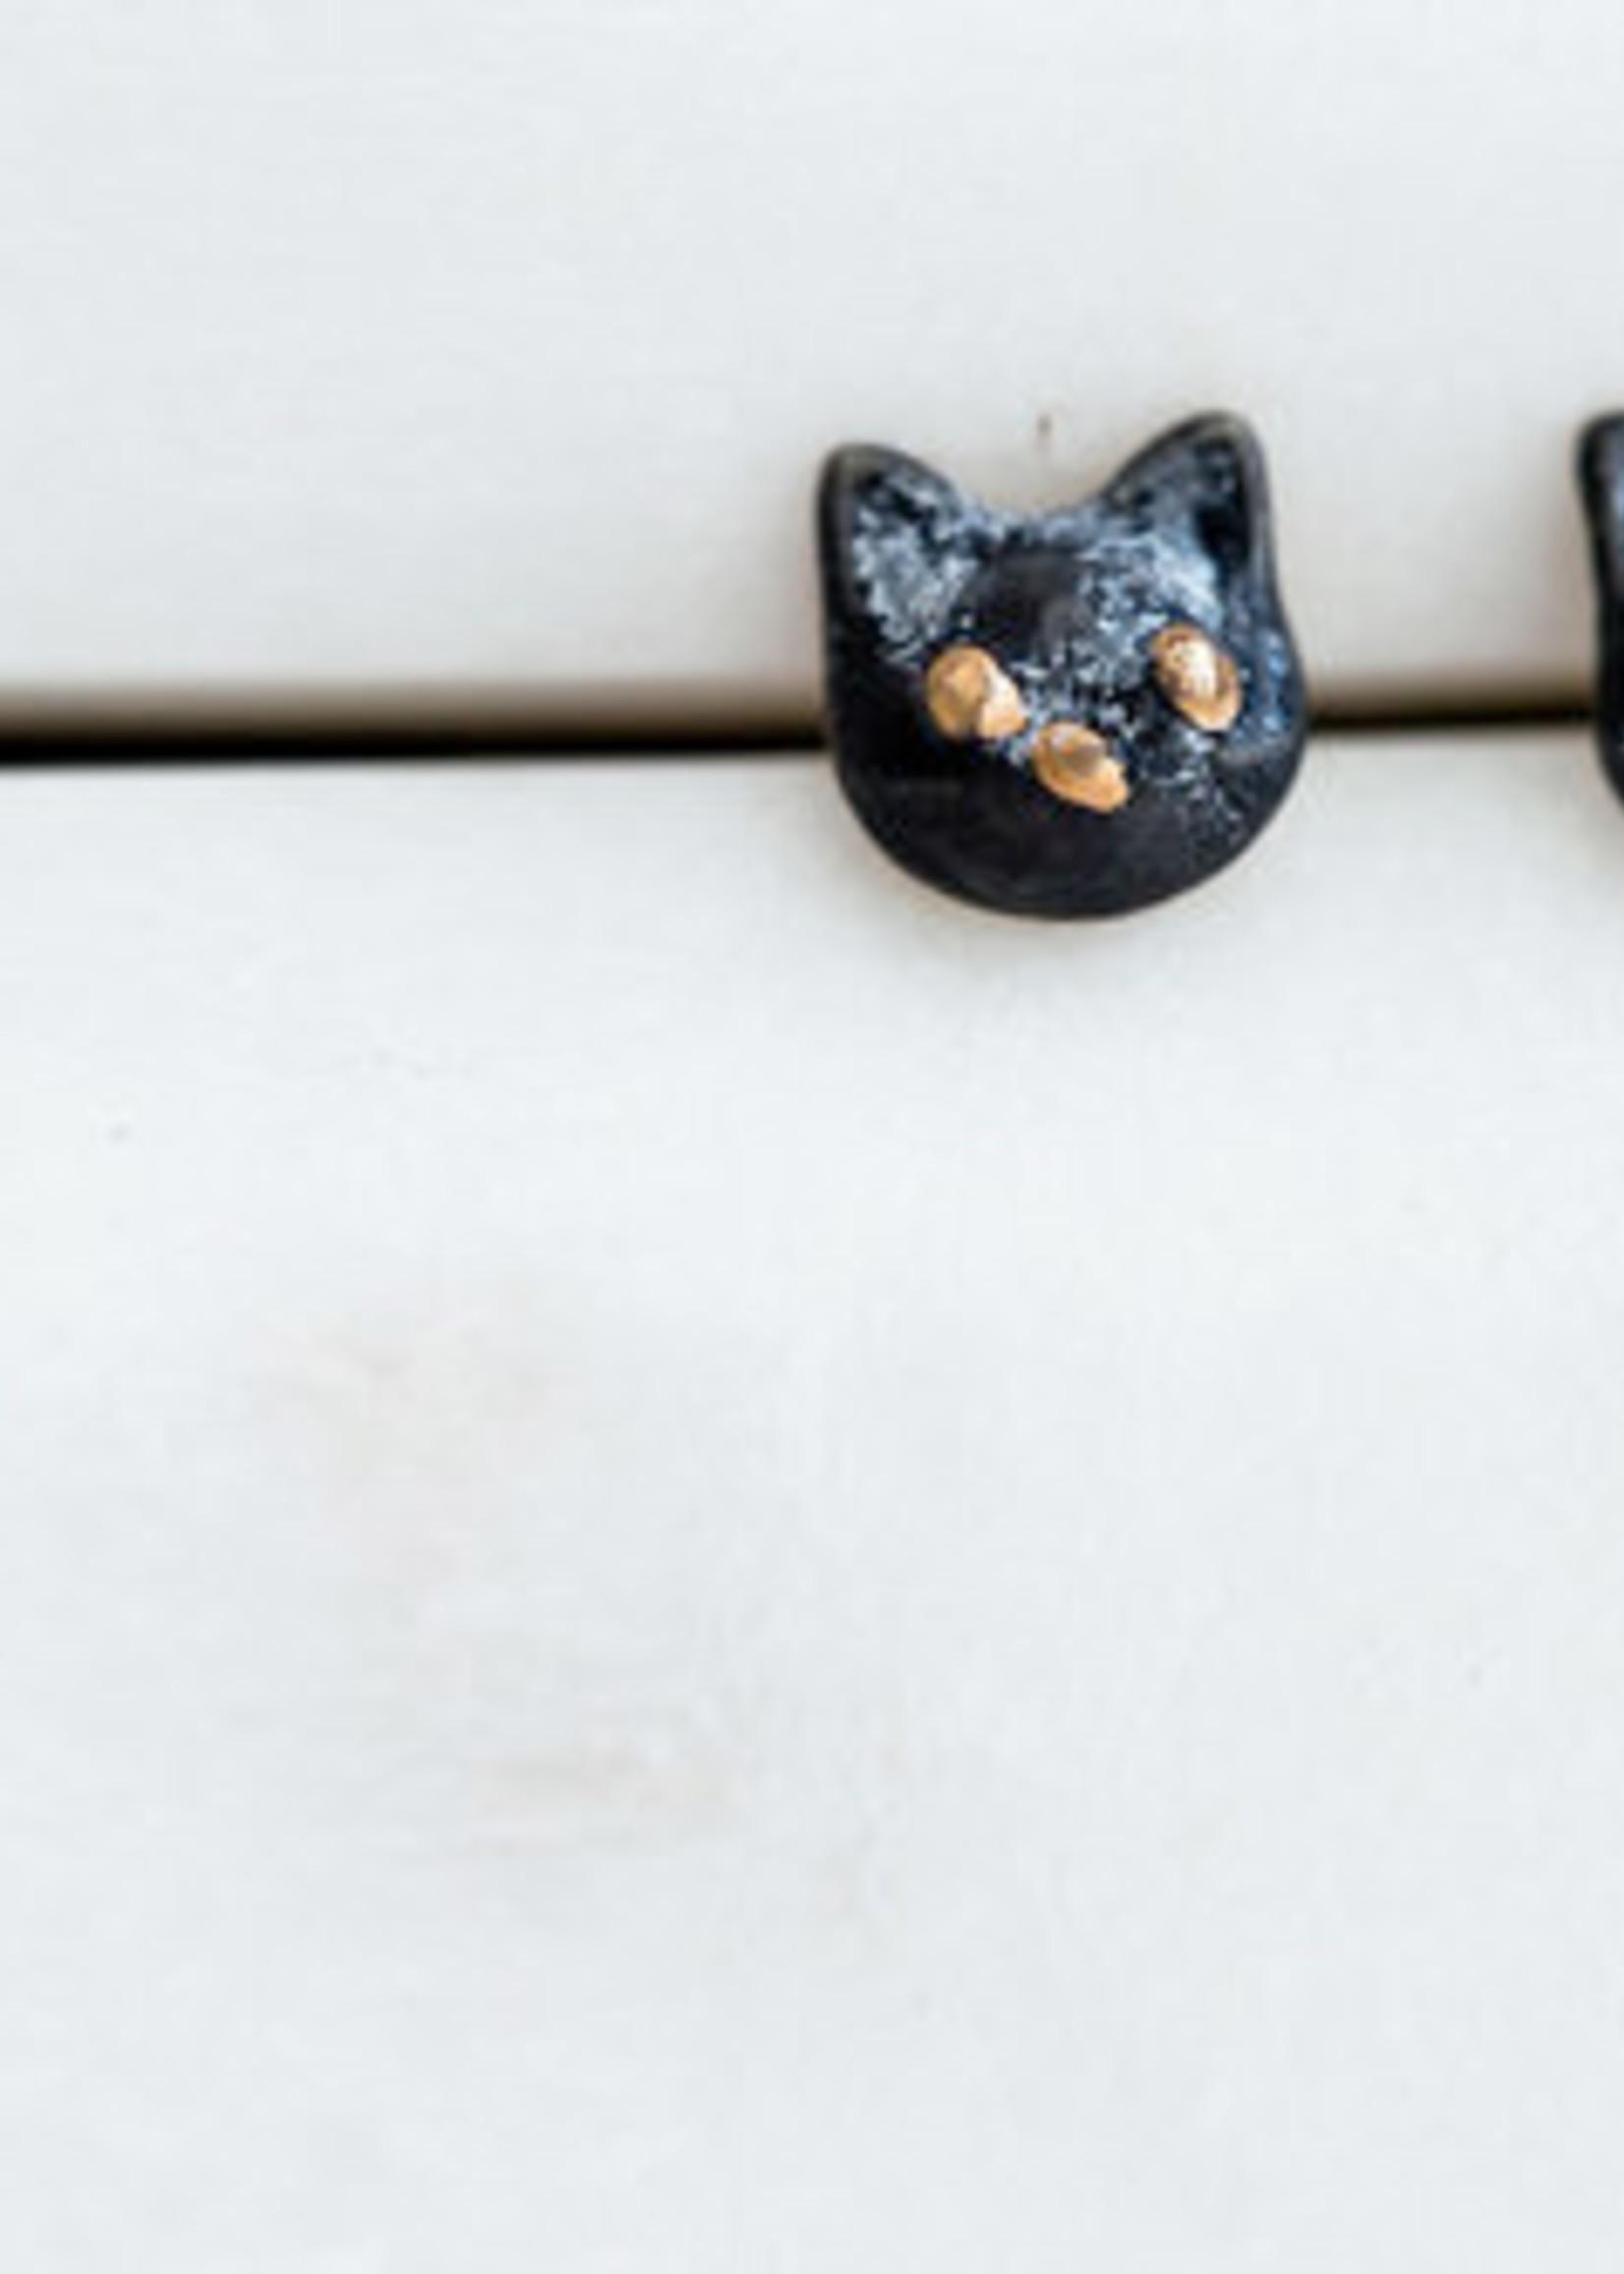 Slade Goods Slade - Black Kitty Studs